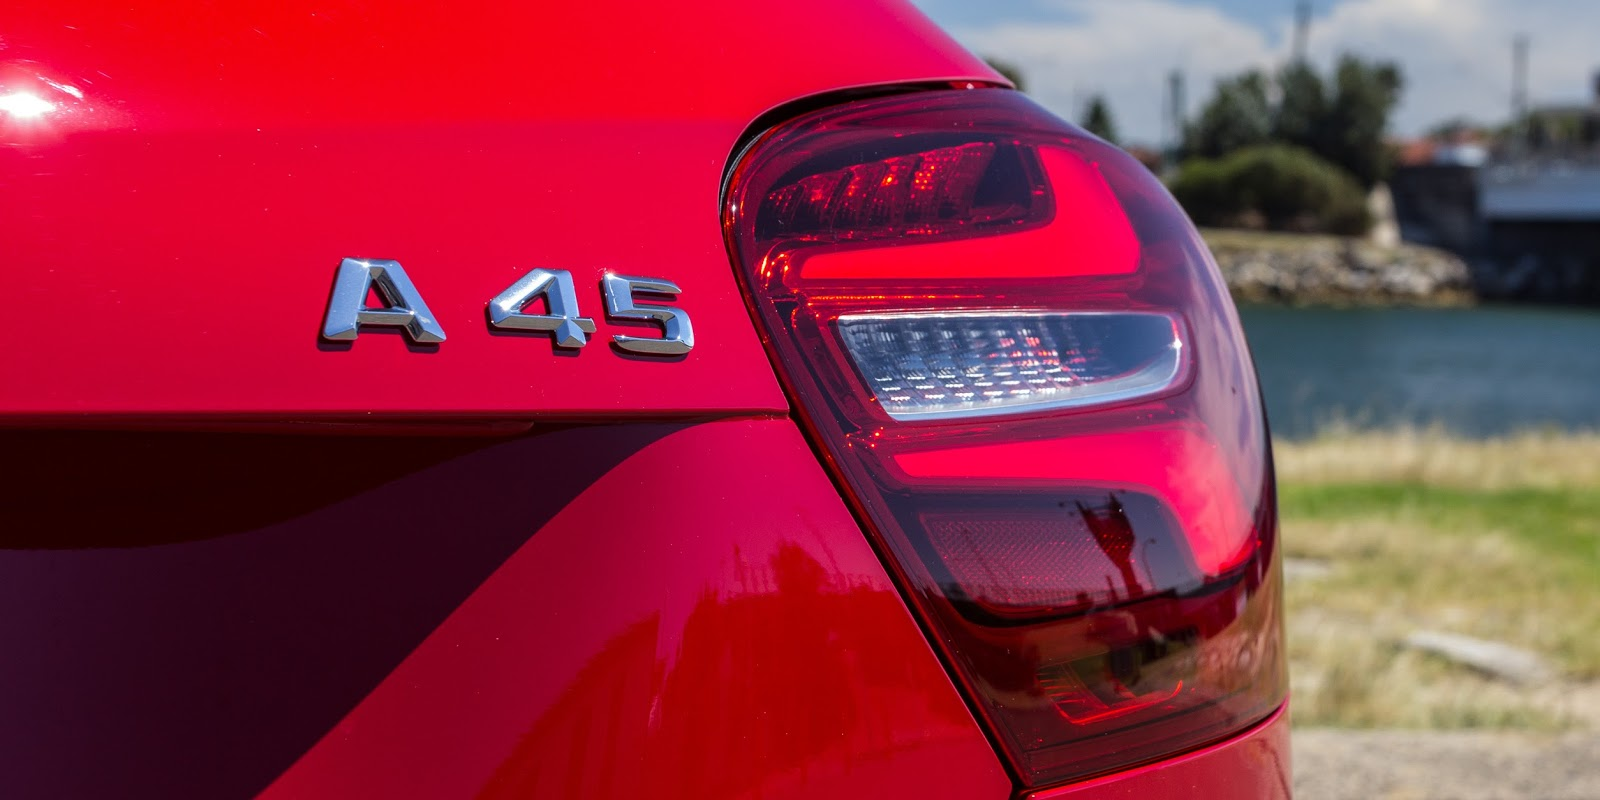 Mercedes AMG A45 4Matic 2016